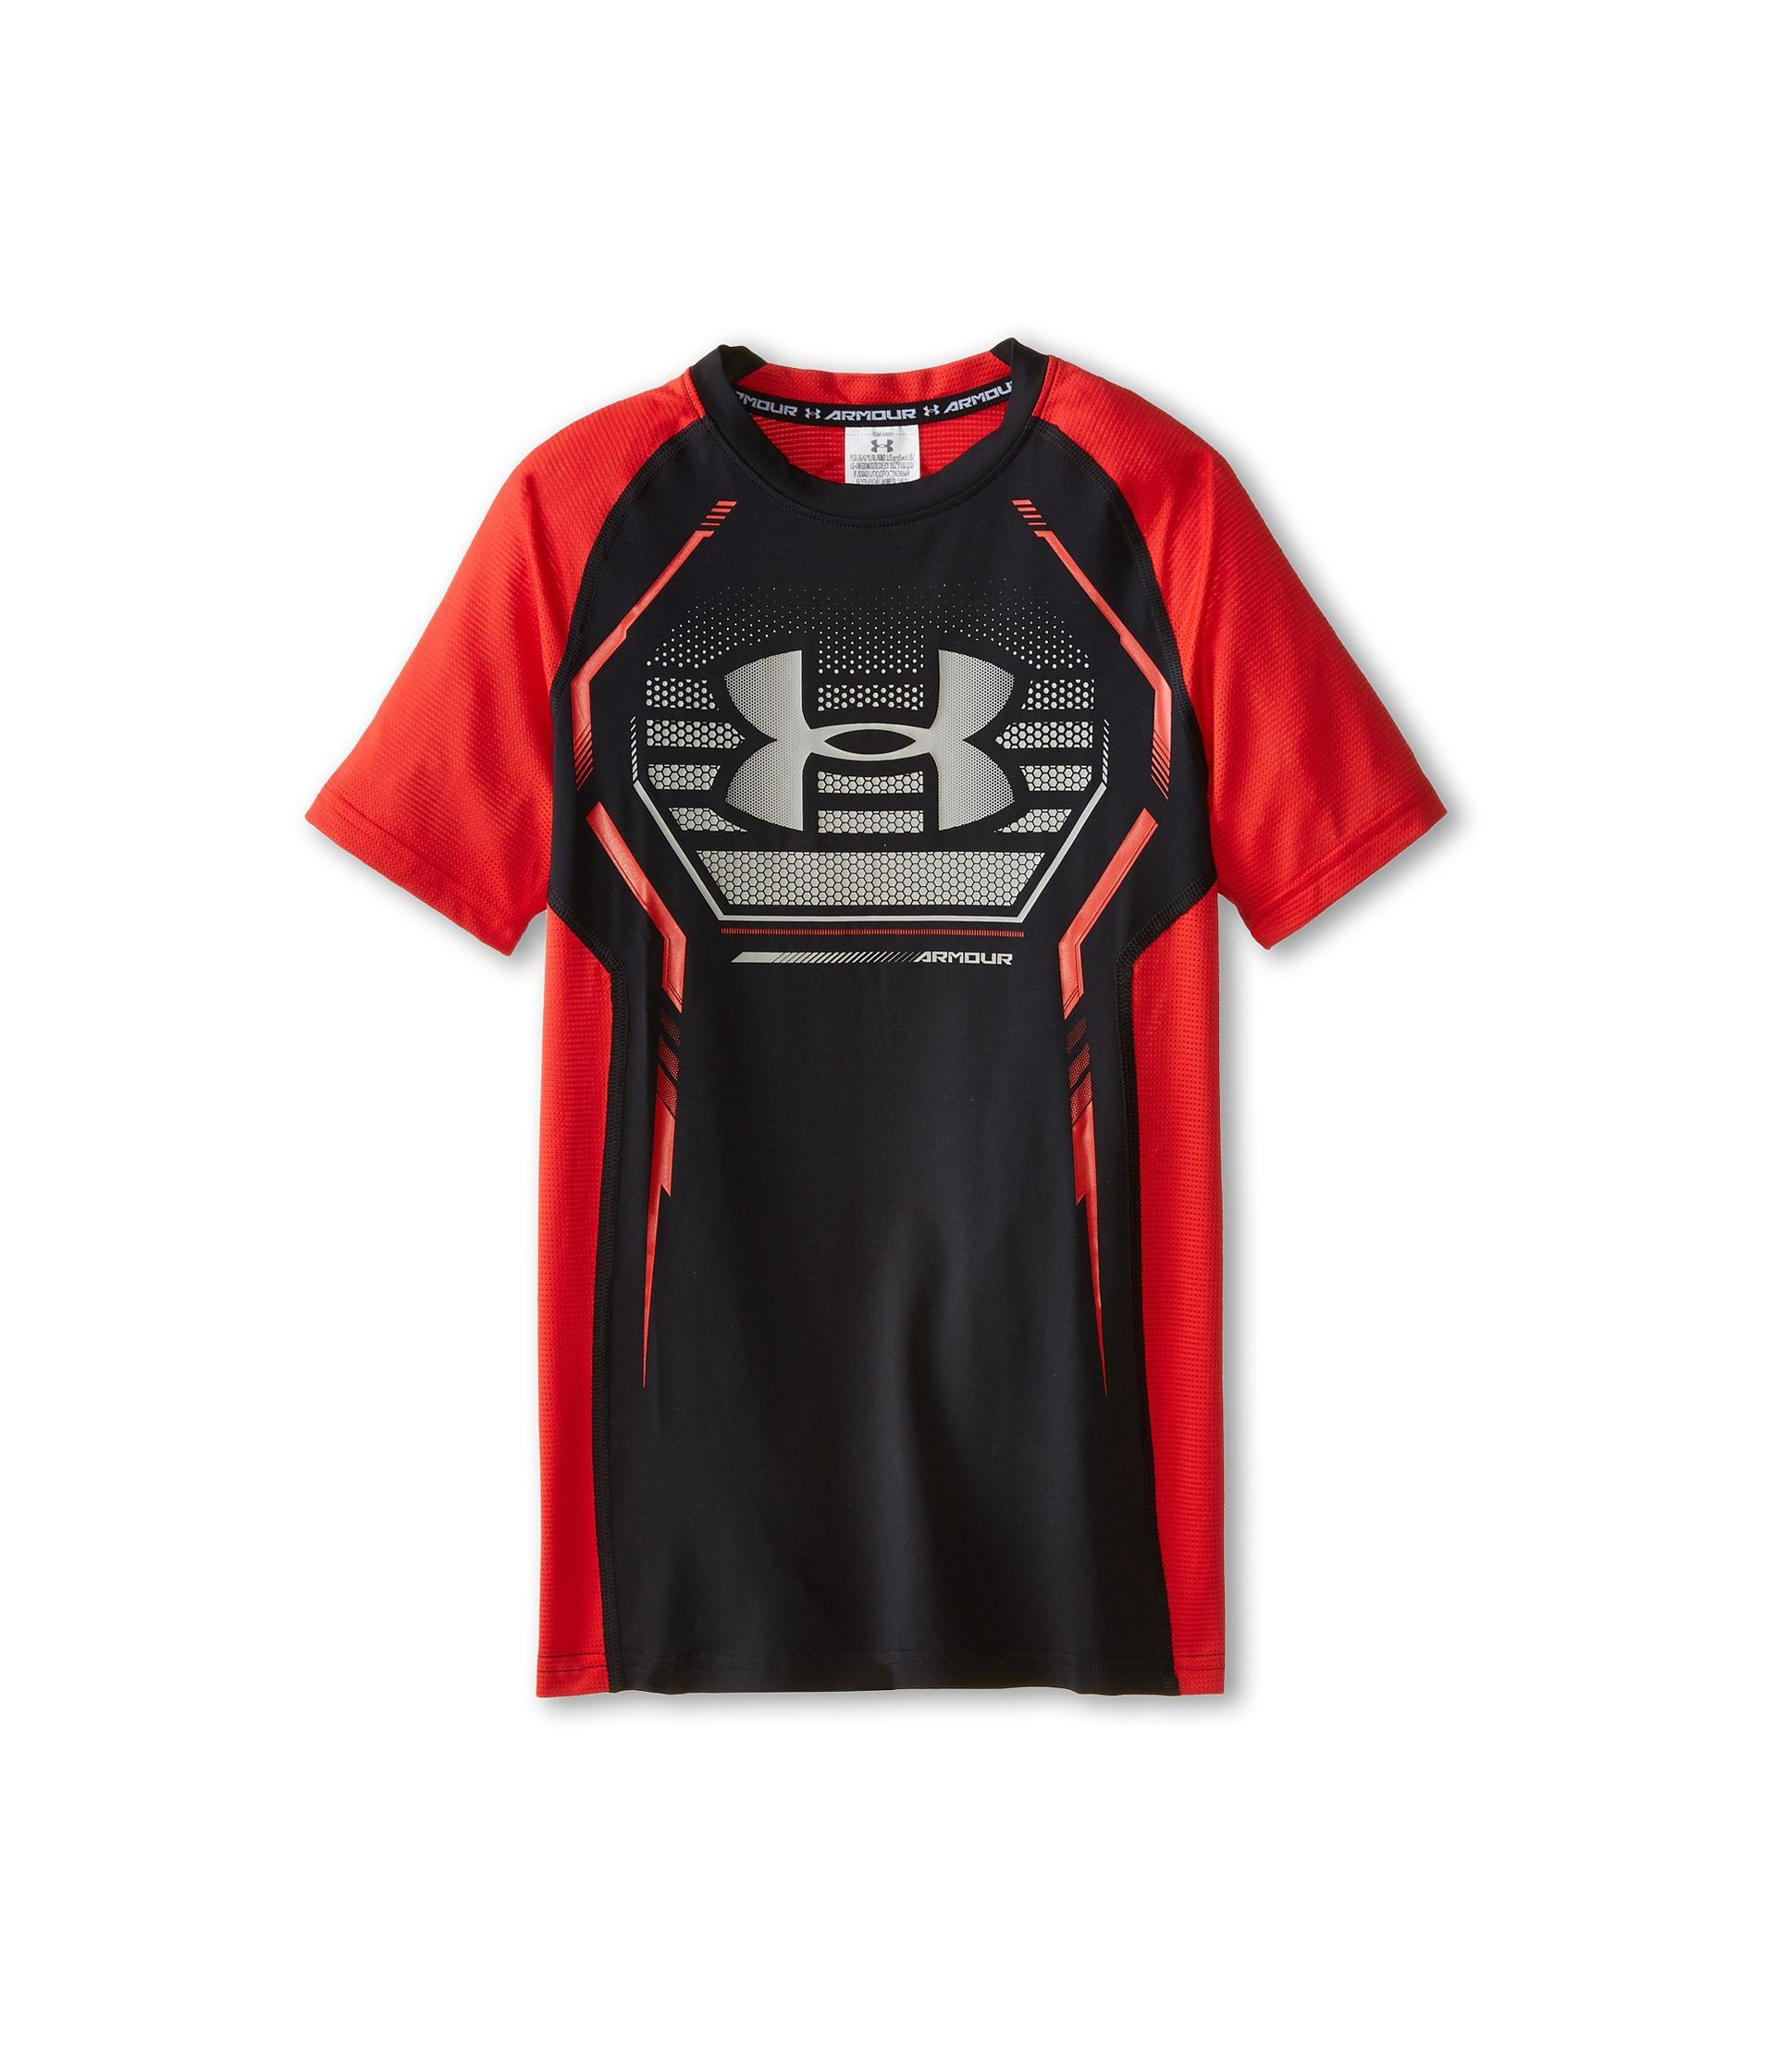 Under armour kids heatgear armour up s s fitted shirt big kids for Under armour shirts for kids